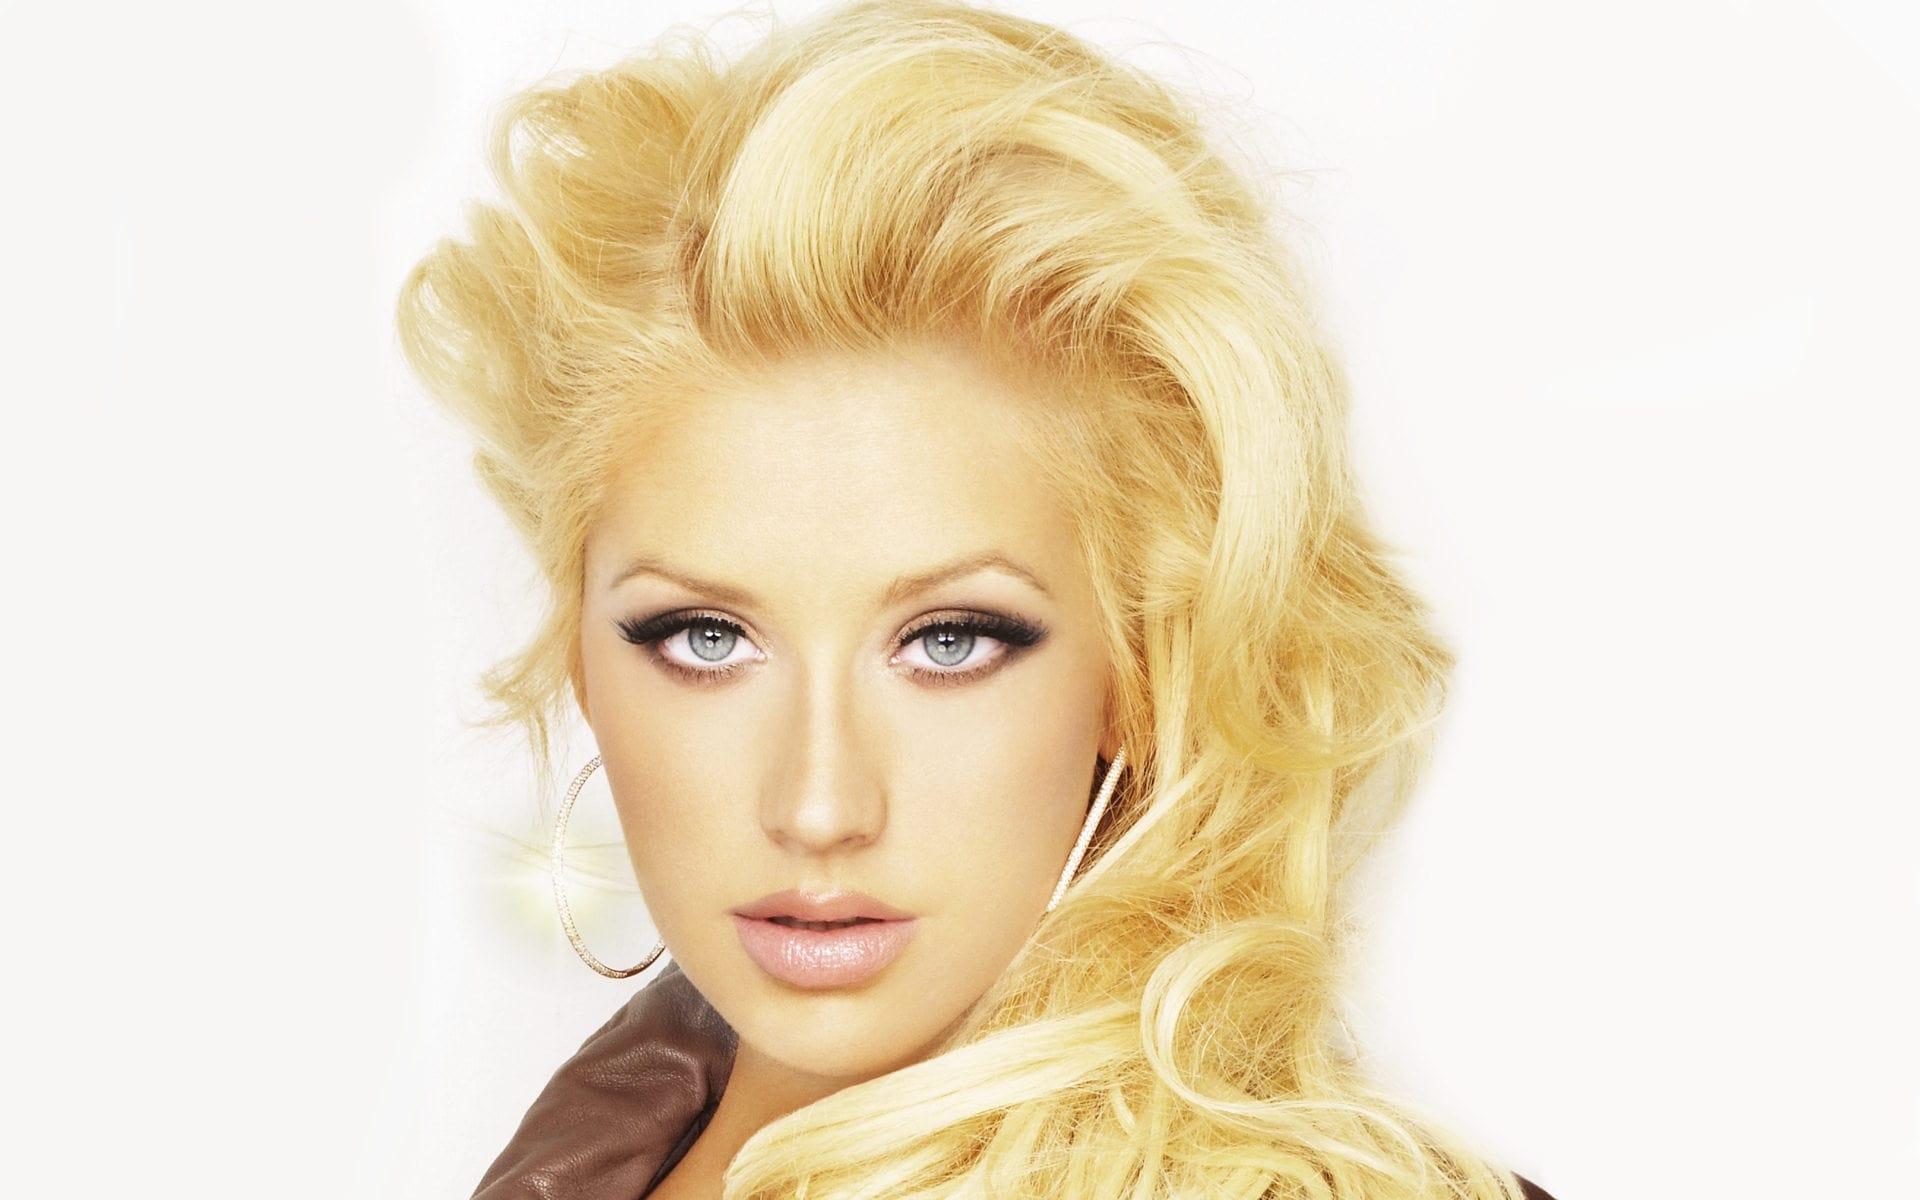 Christina Aguilera widescreen wallpapers